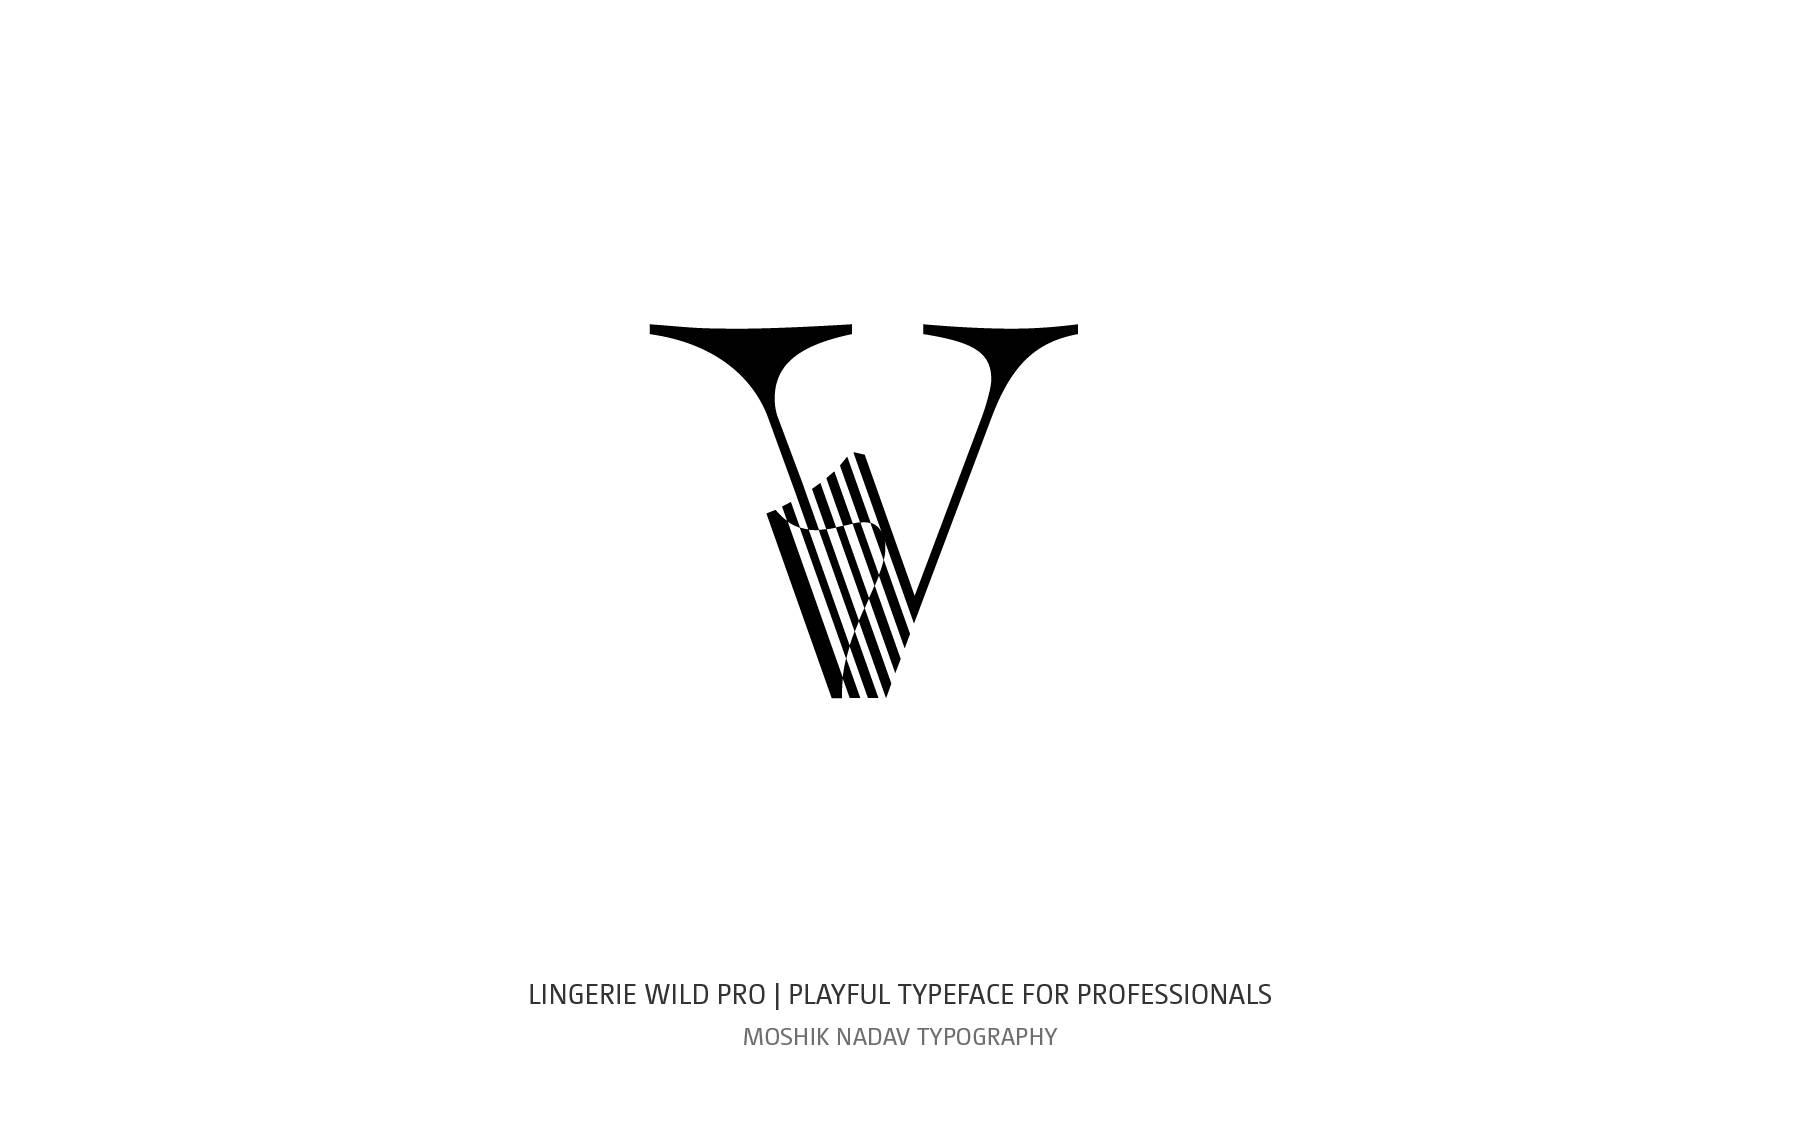 Lingerie Wild Pro Typeface by Moshik Nadav Typography NYC